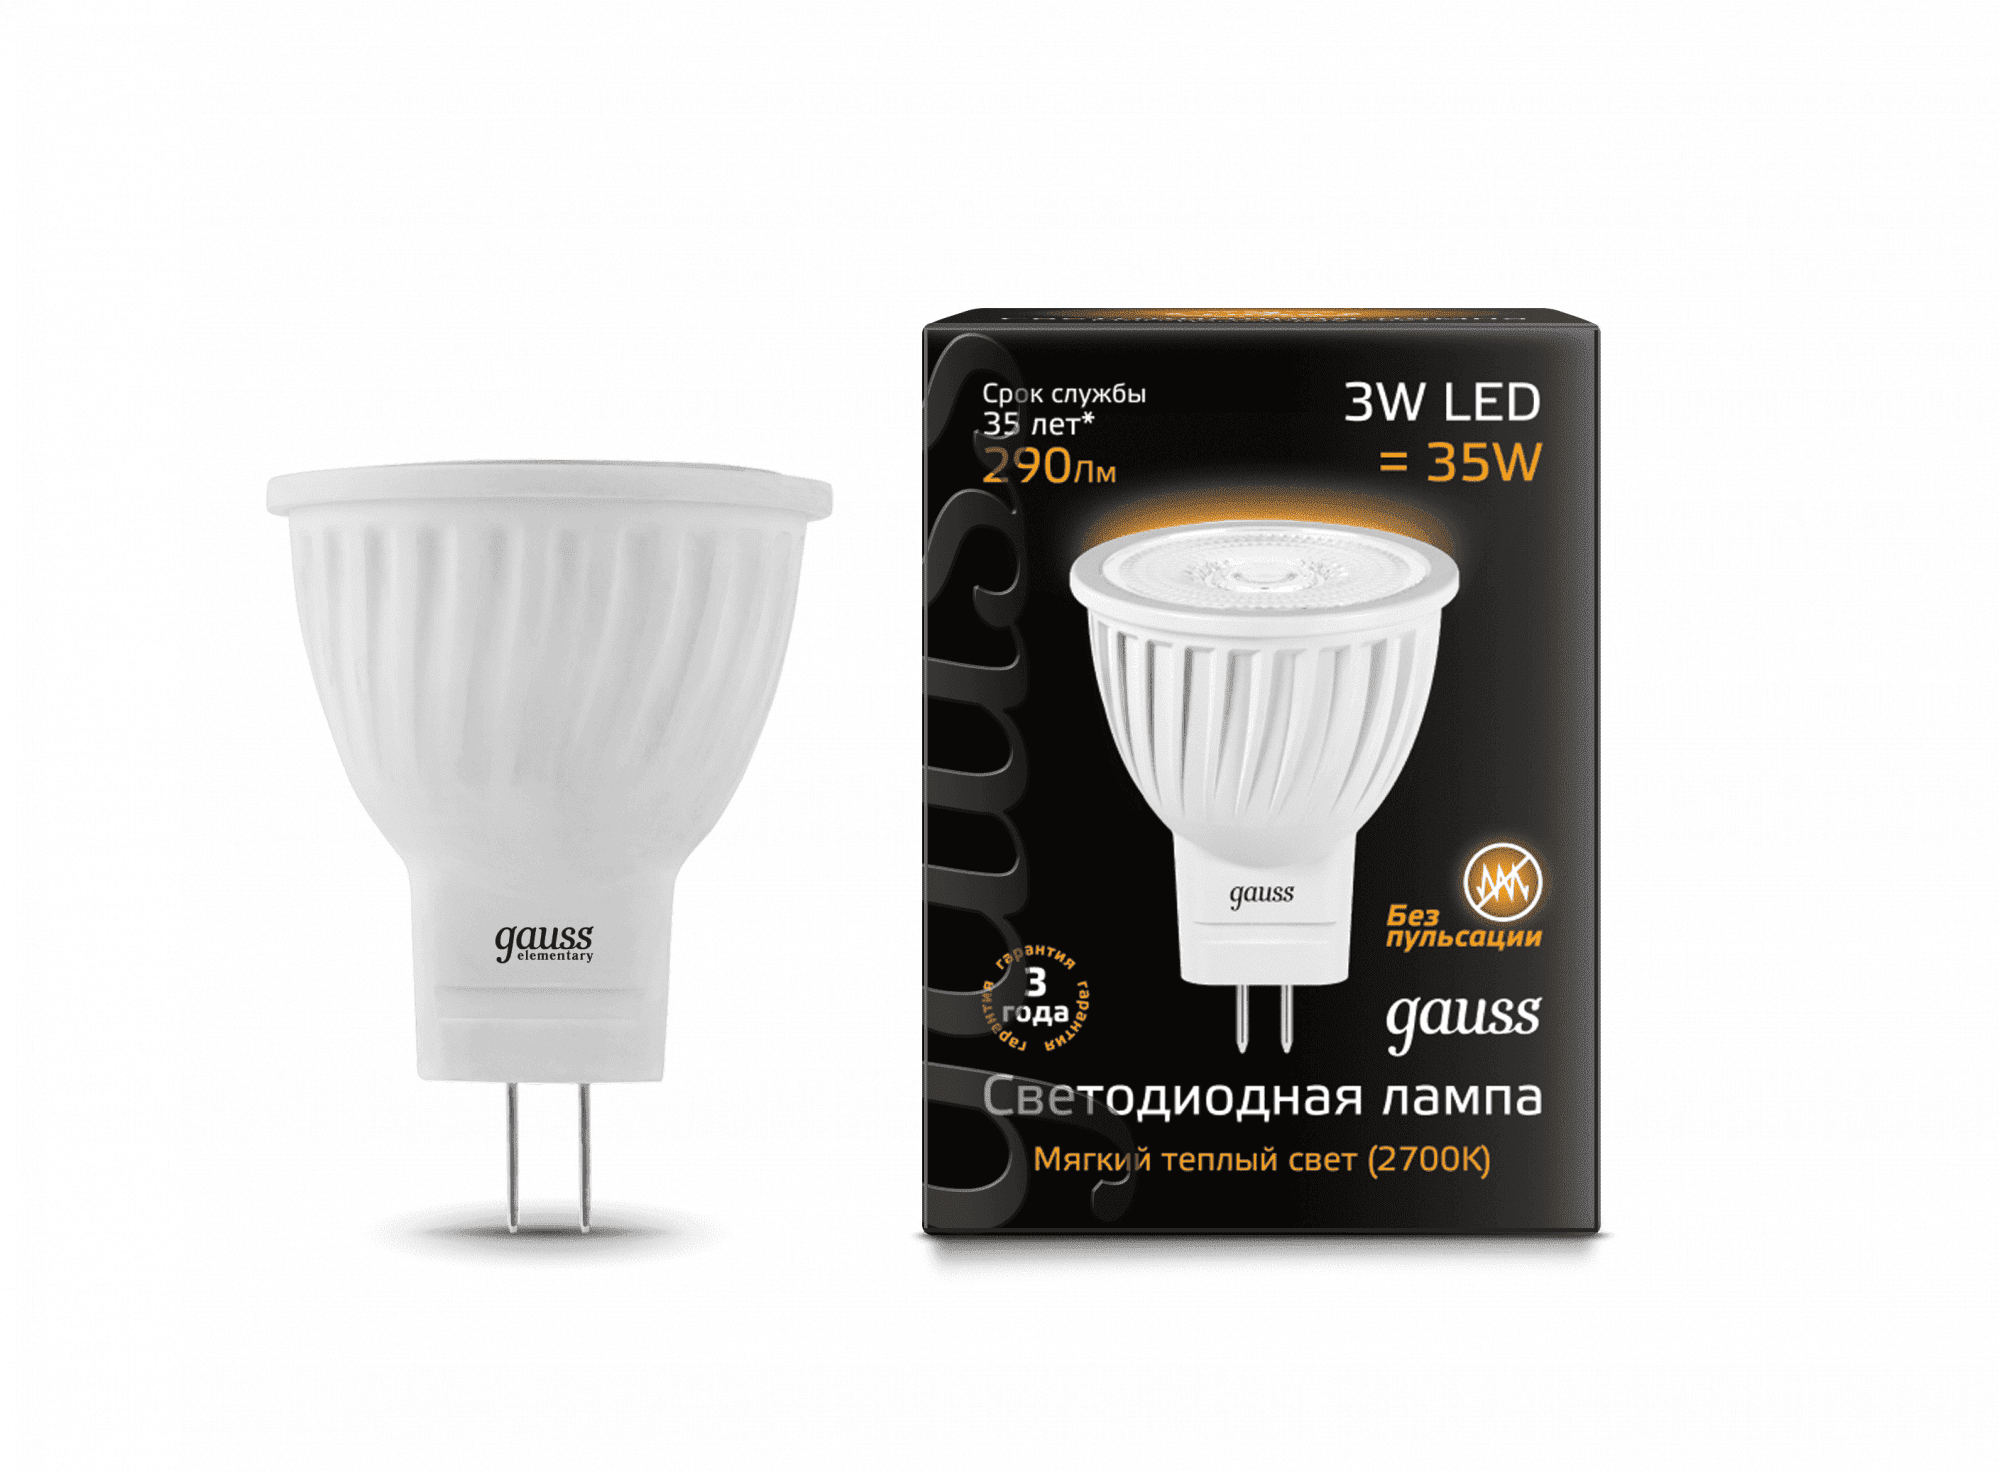 Gauss LED D35*45 3W MR11 GU4 2700K 1/10/100 арт. 132517103